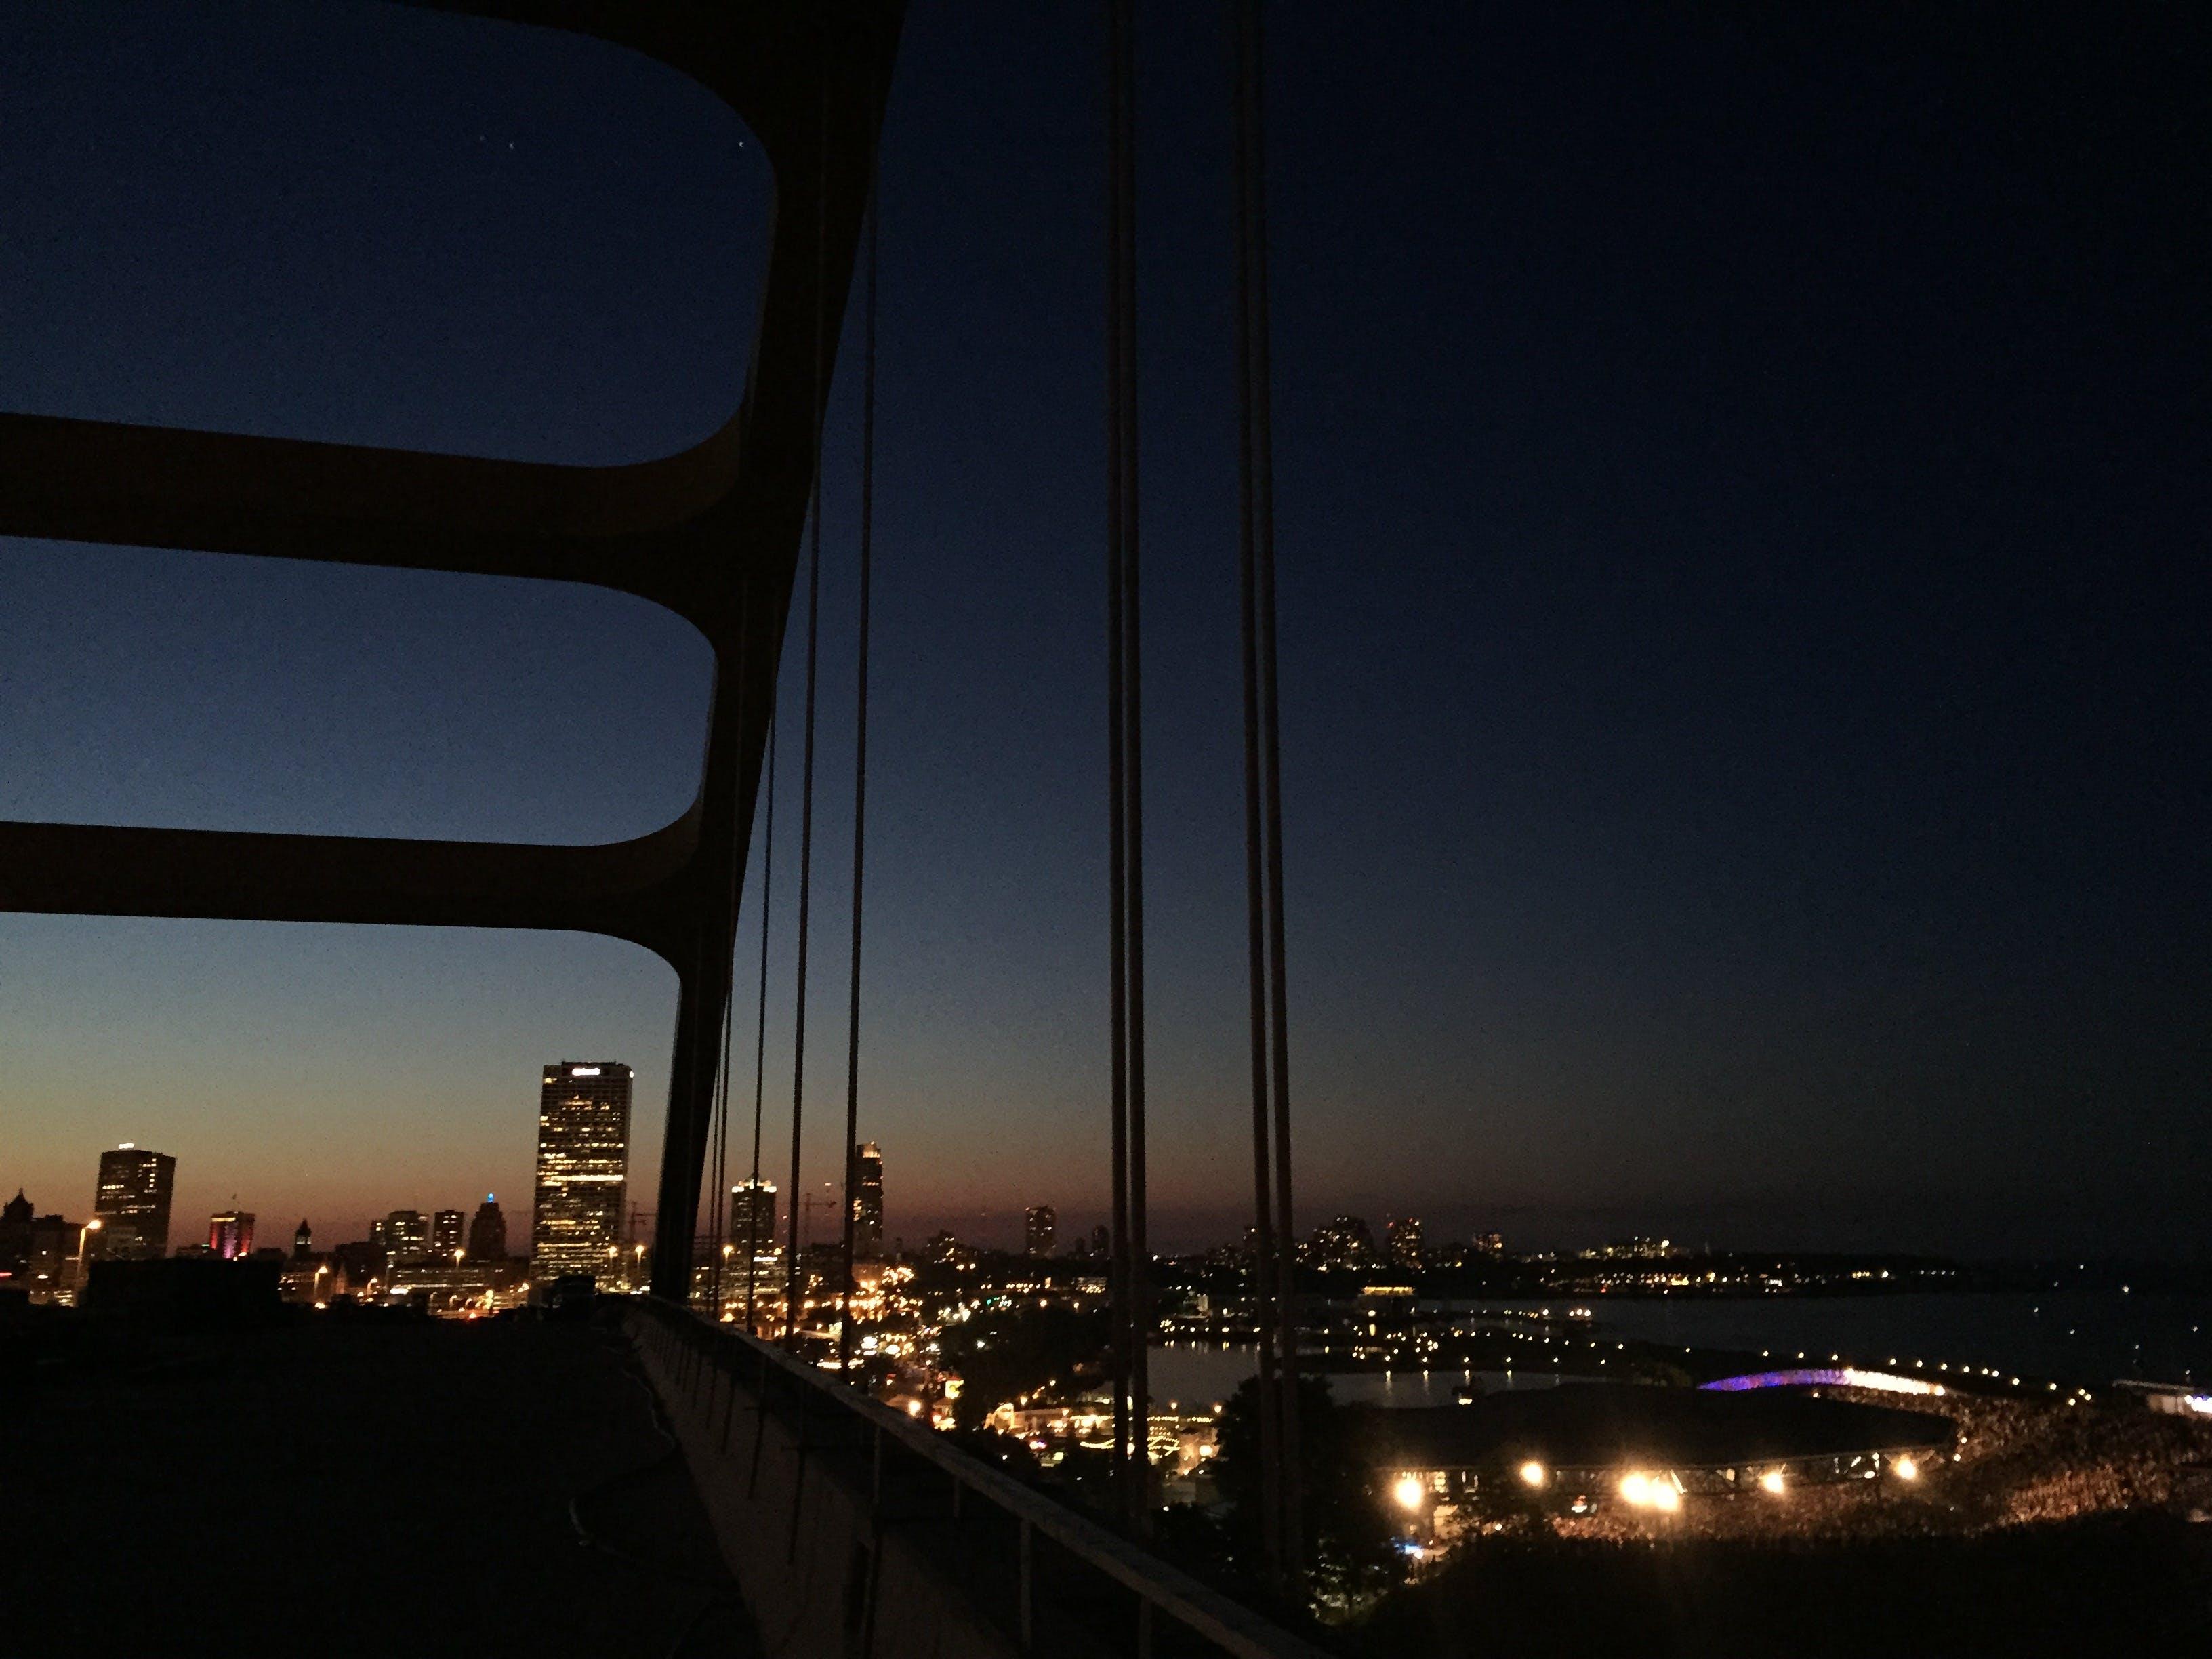 ampitheatre, city, city night